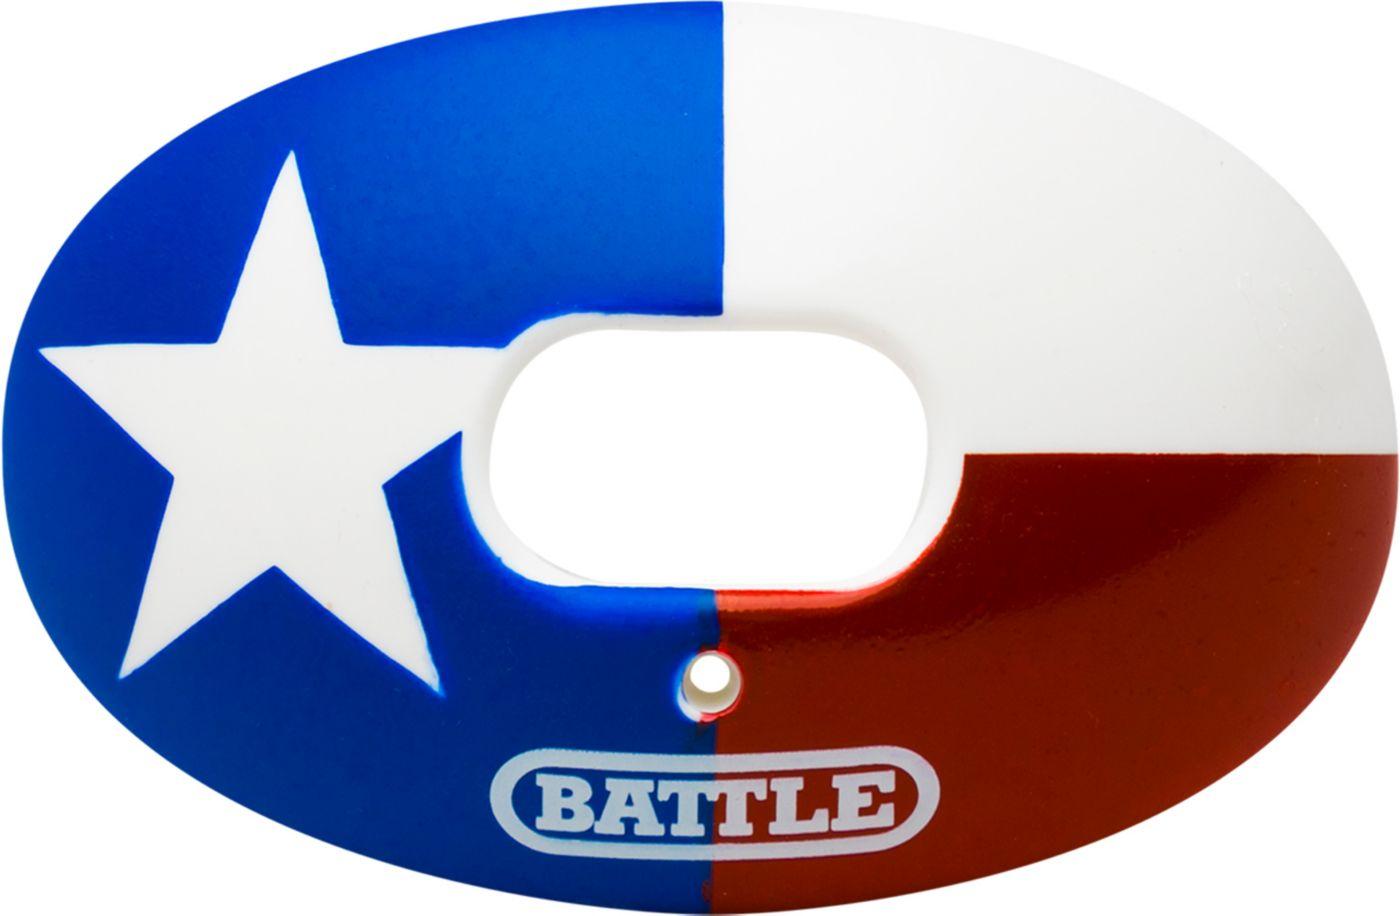 Battle Oxygen Texas Convertible Mouthguard